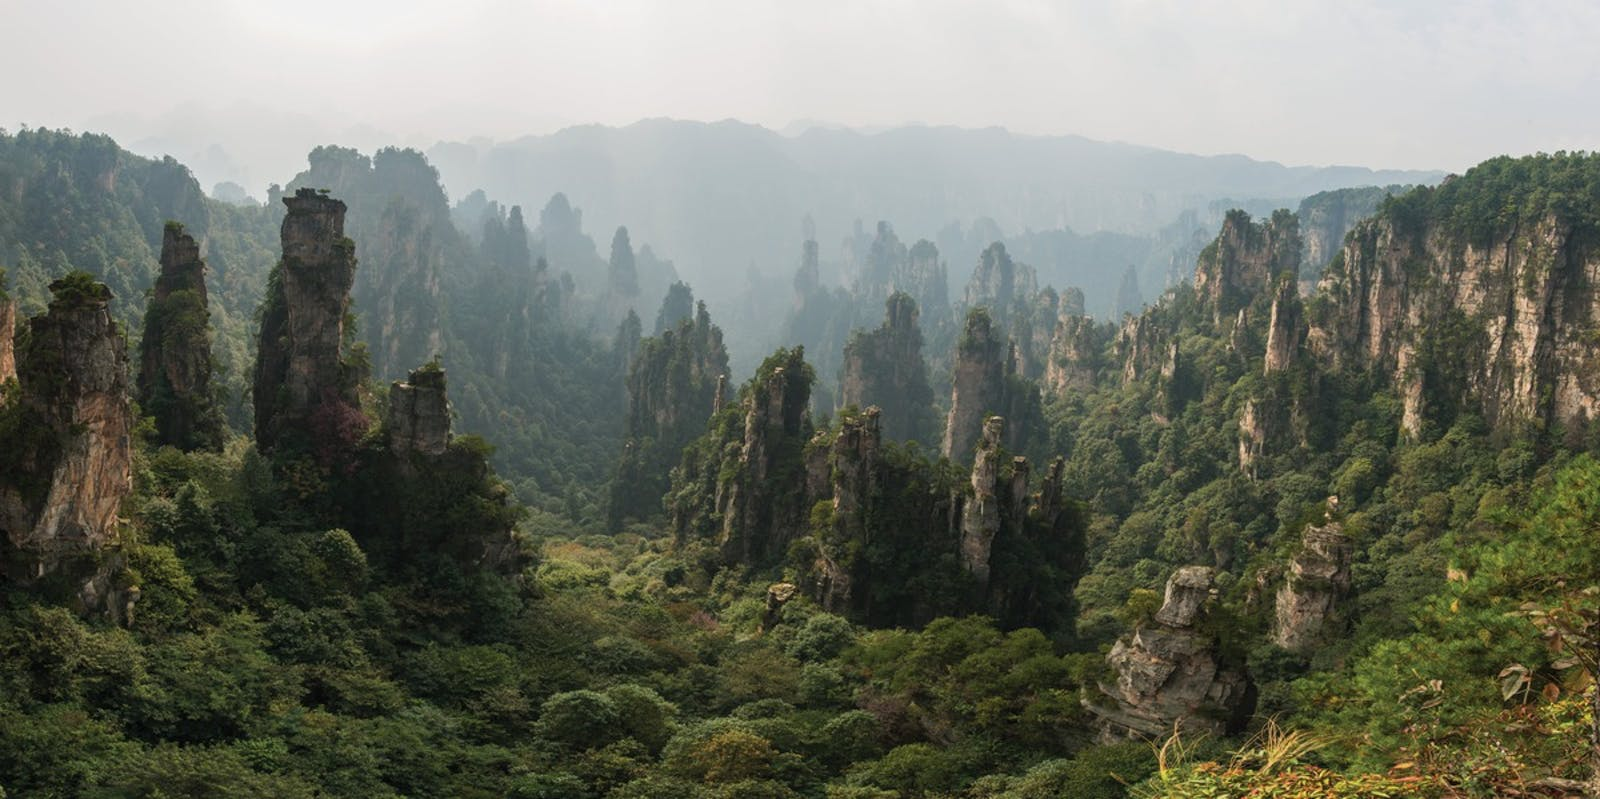 Guizhou Plateau Broadleaf and Mixed Forests